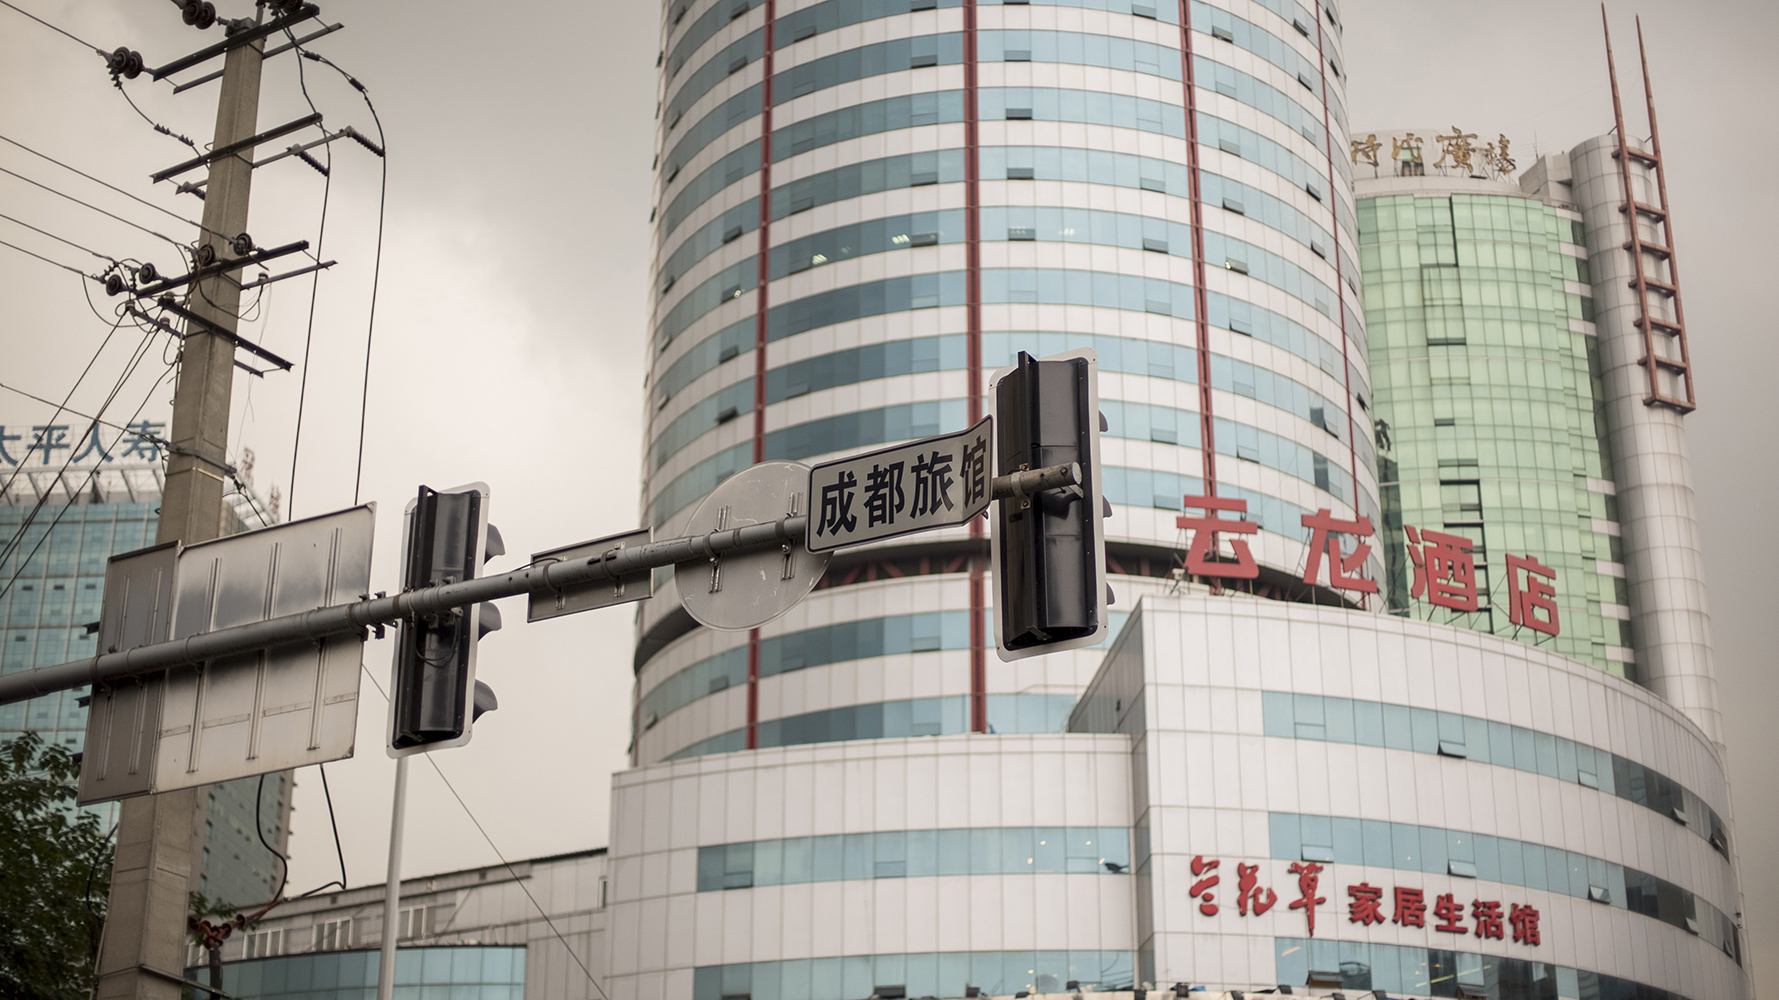 Building in Chengdu